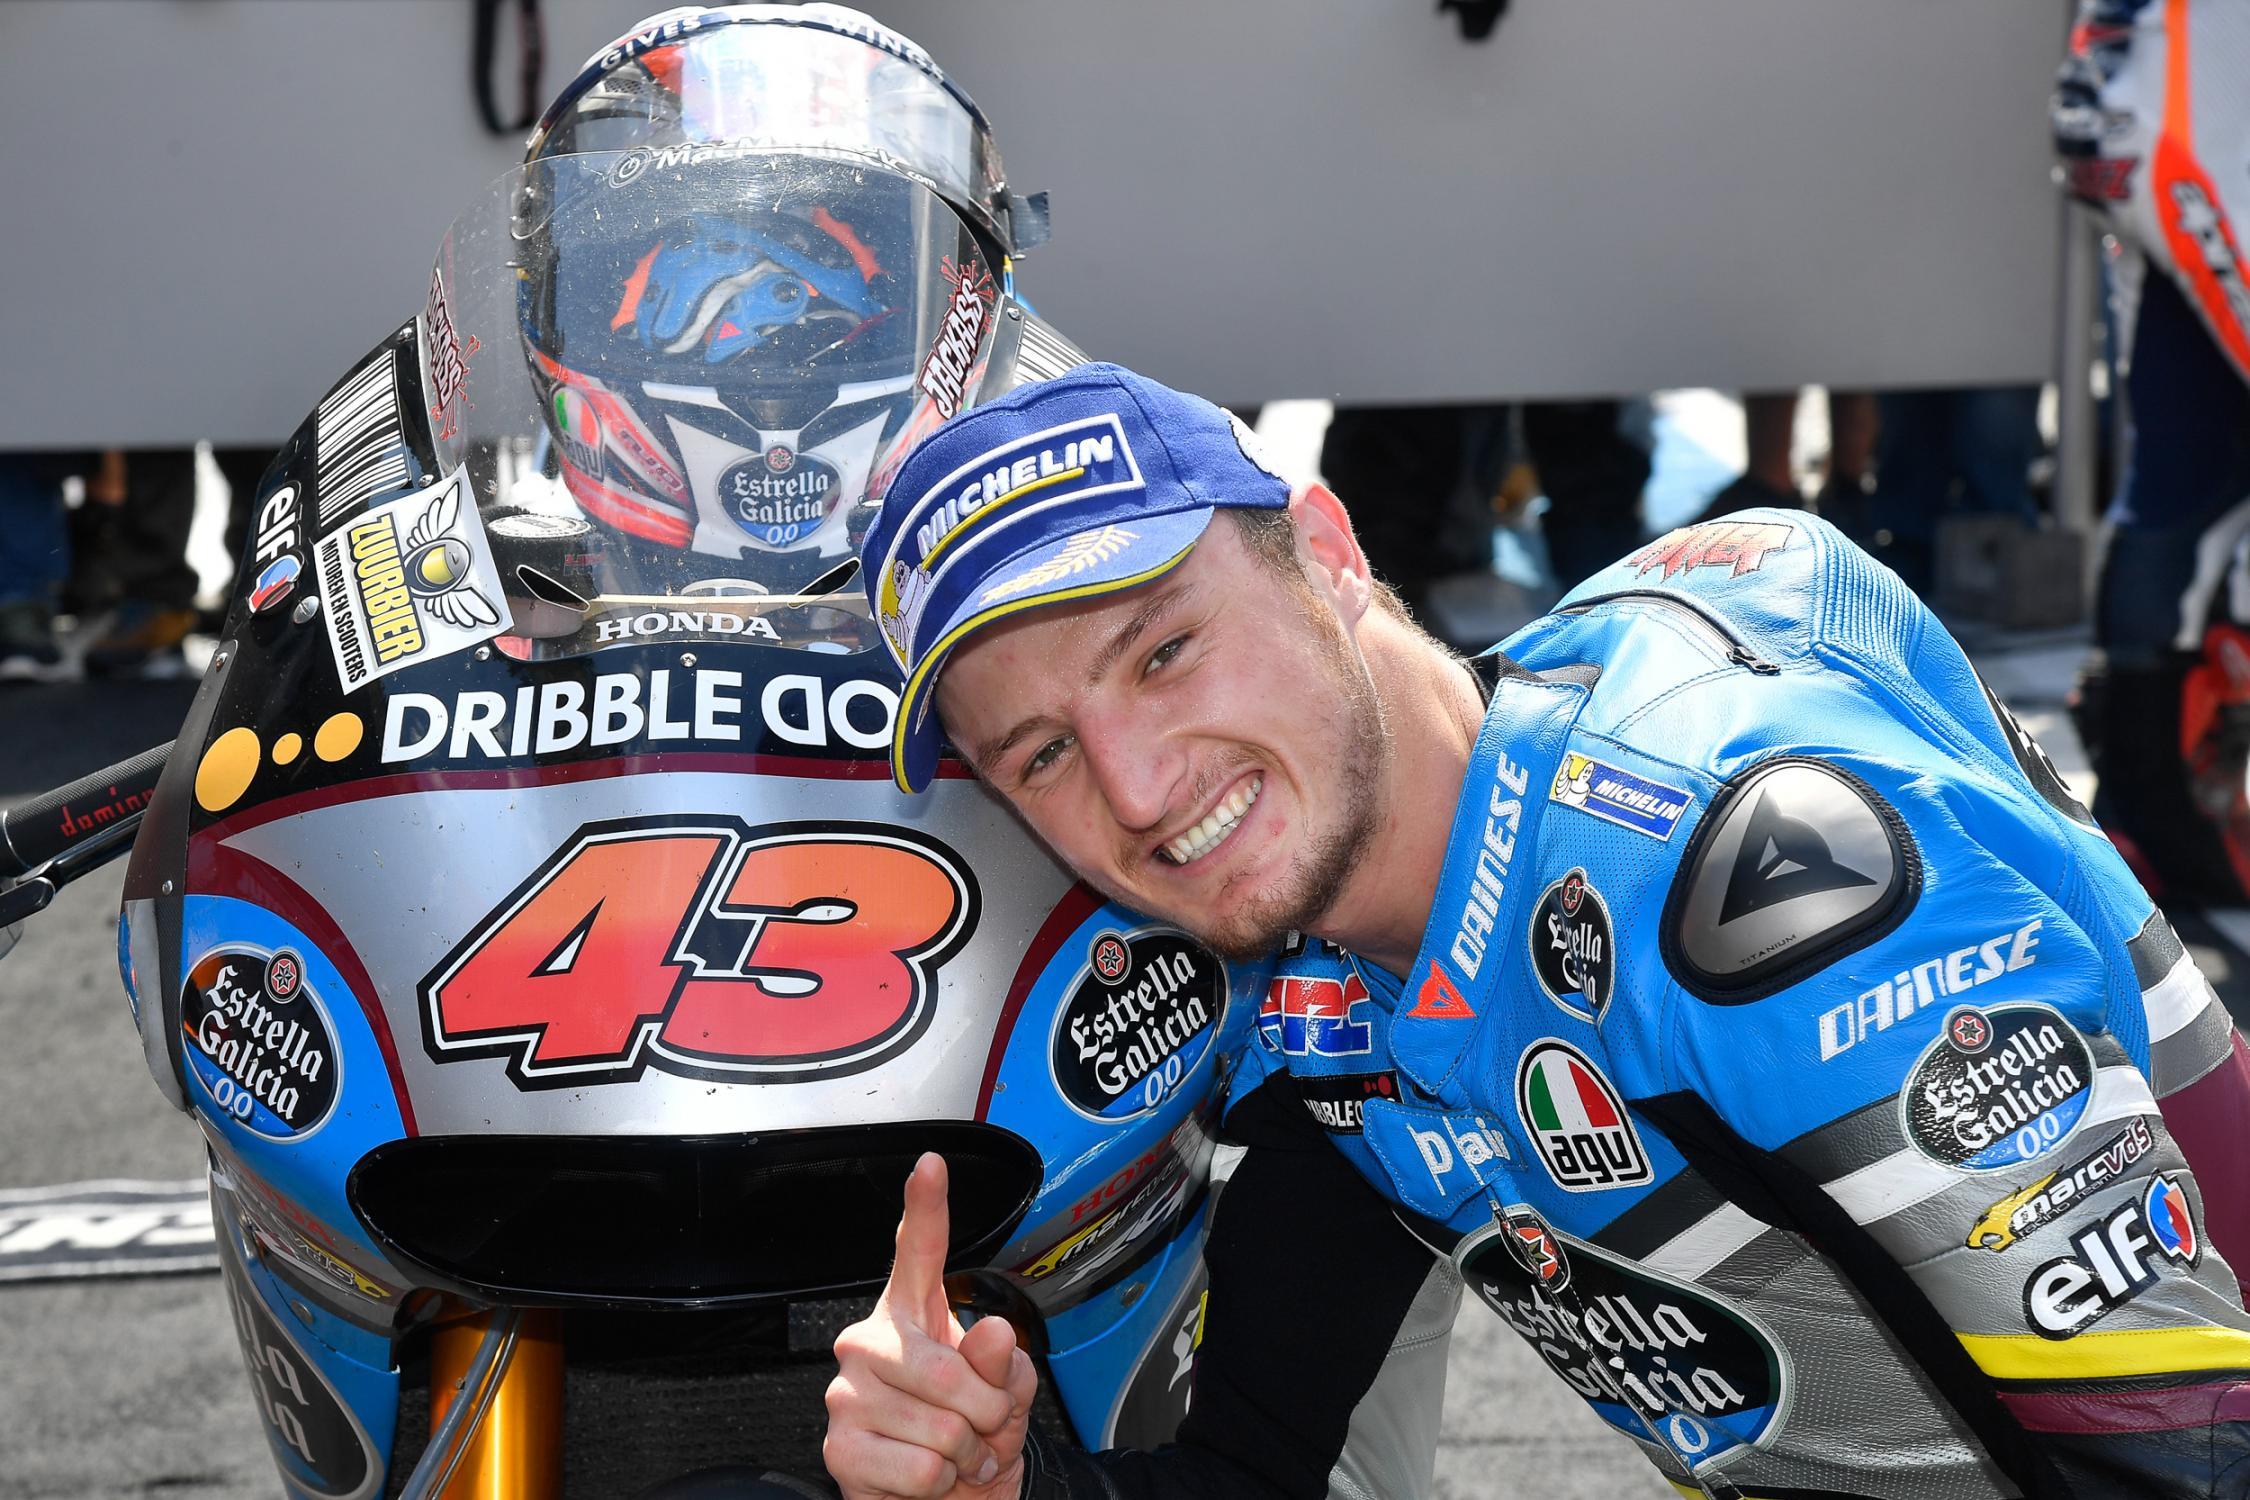 Sensacional primera victoria de Jack Miller en MotoGP